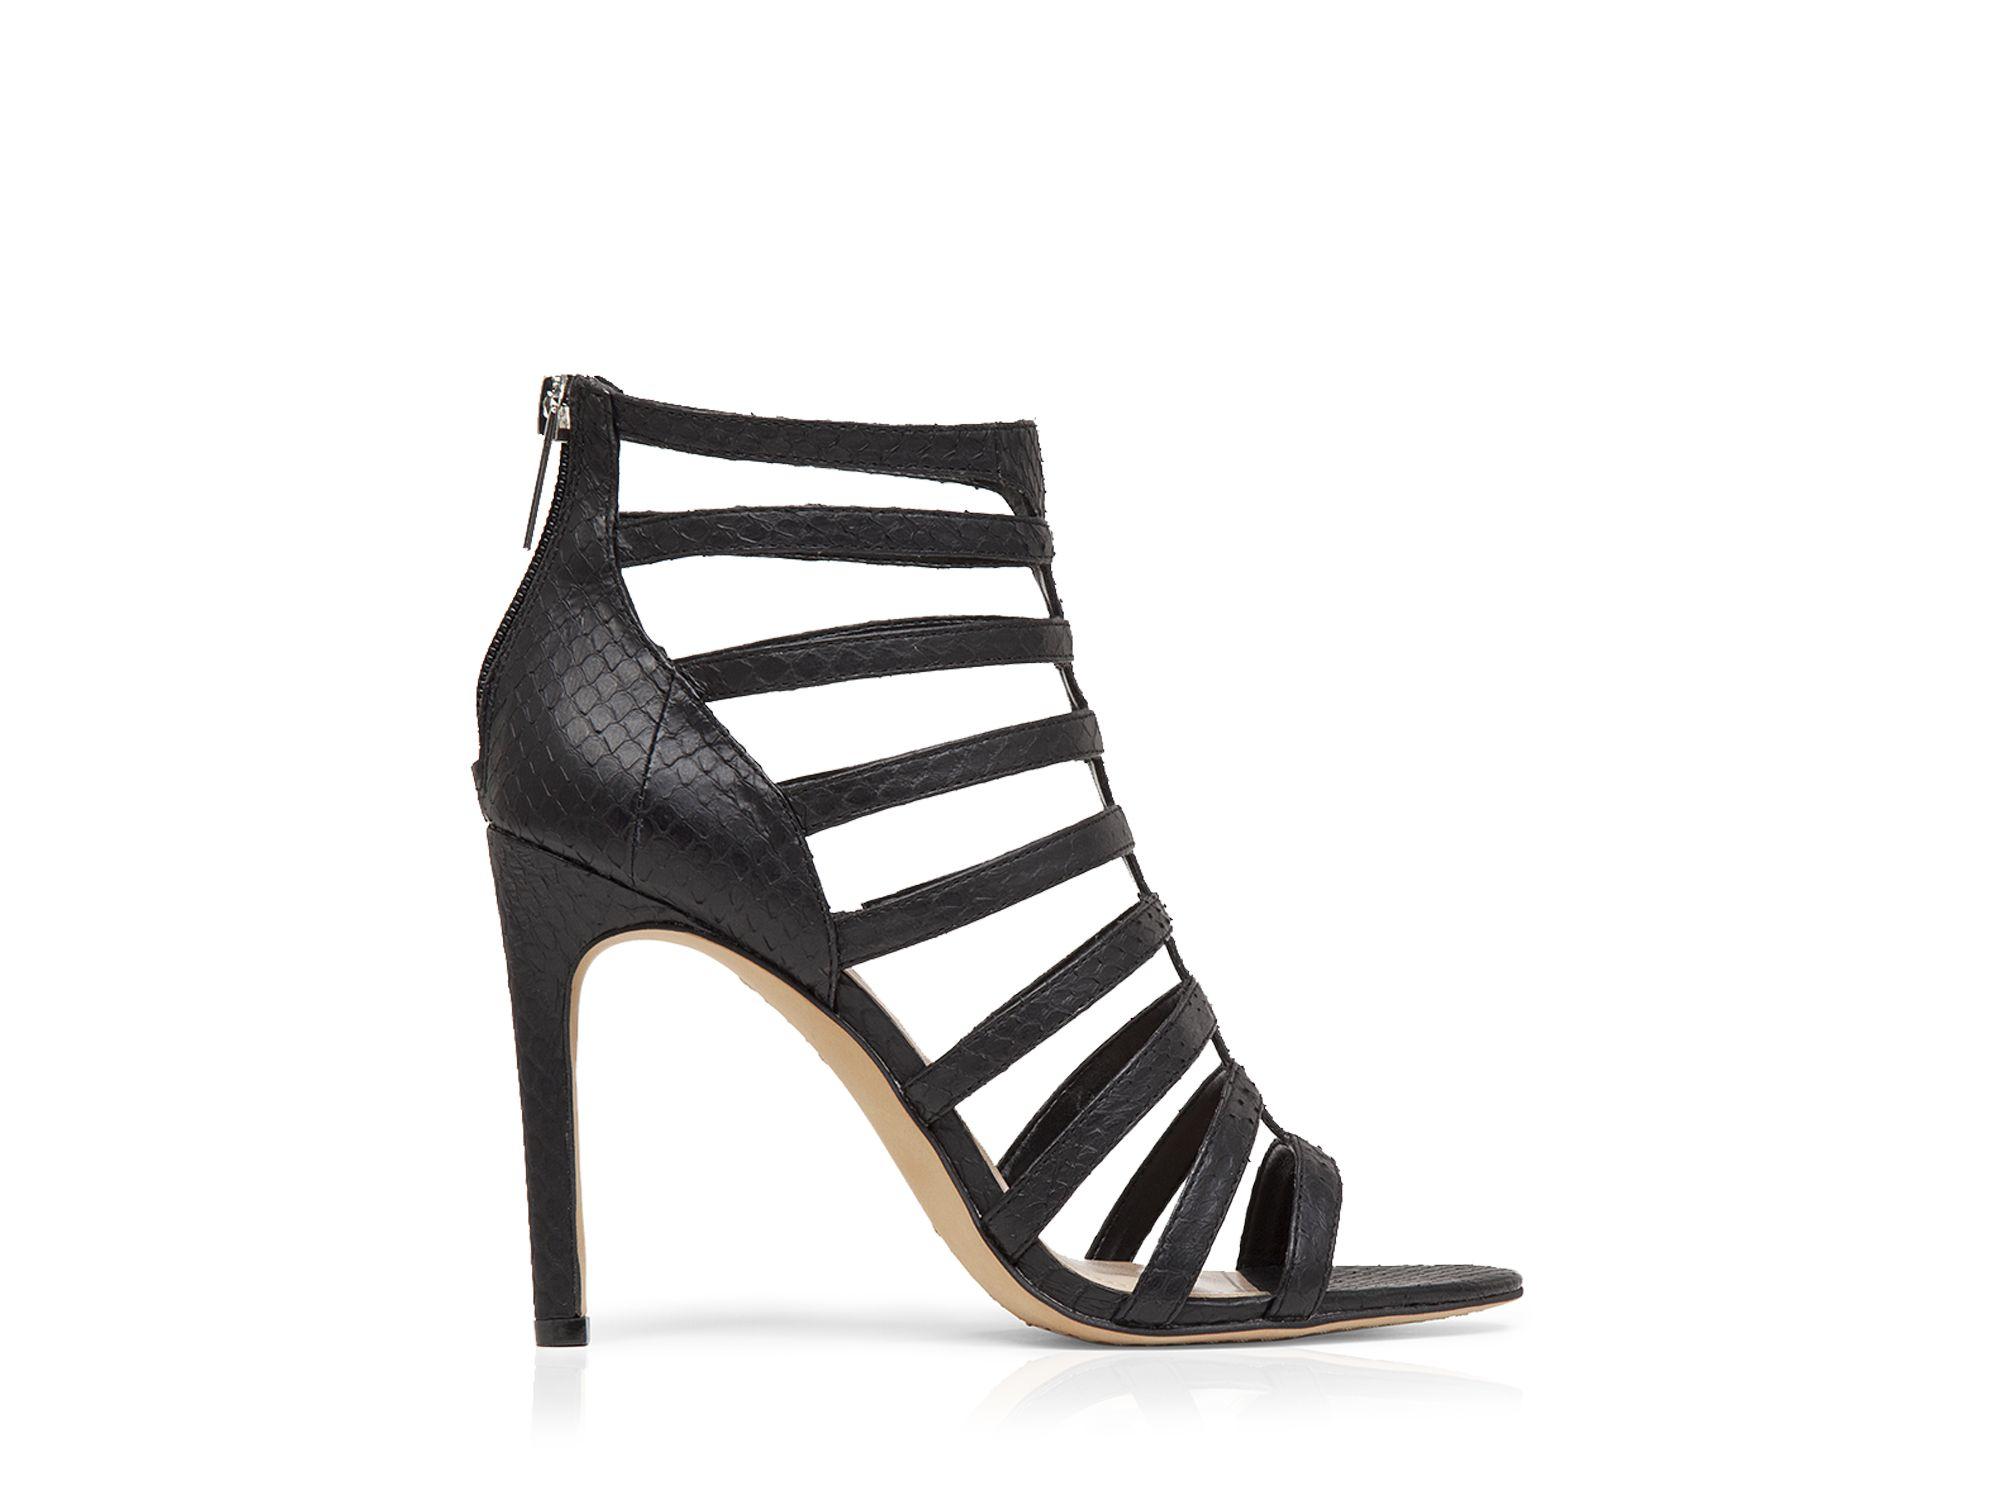 2b87a97337f Lyst vince camuto open toe caged gladiator sandals kamella high heel jpg  2000x1500 Gladiator sandals vince